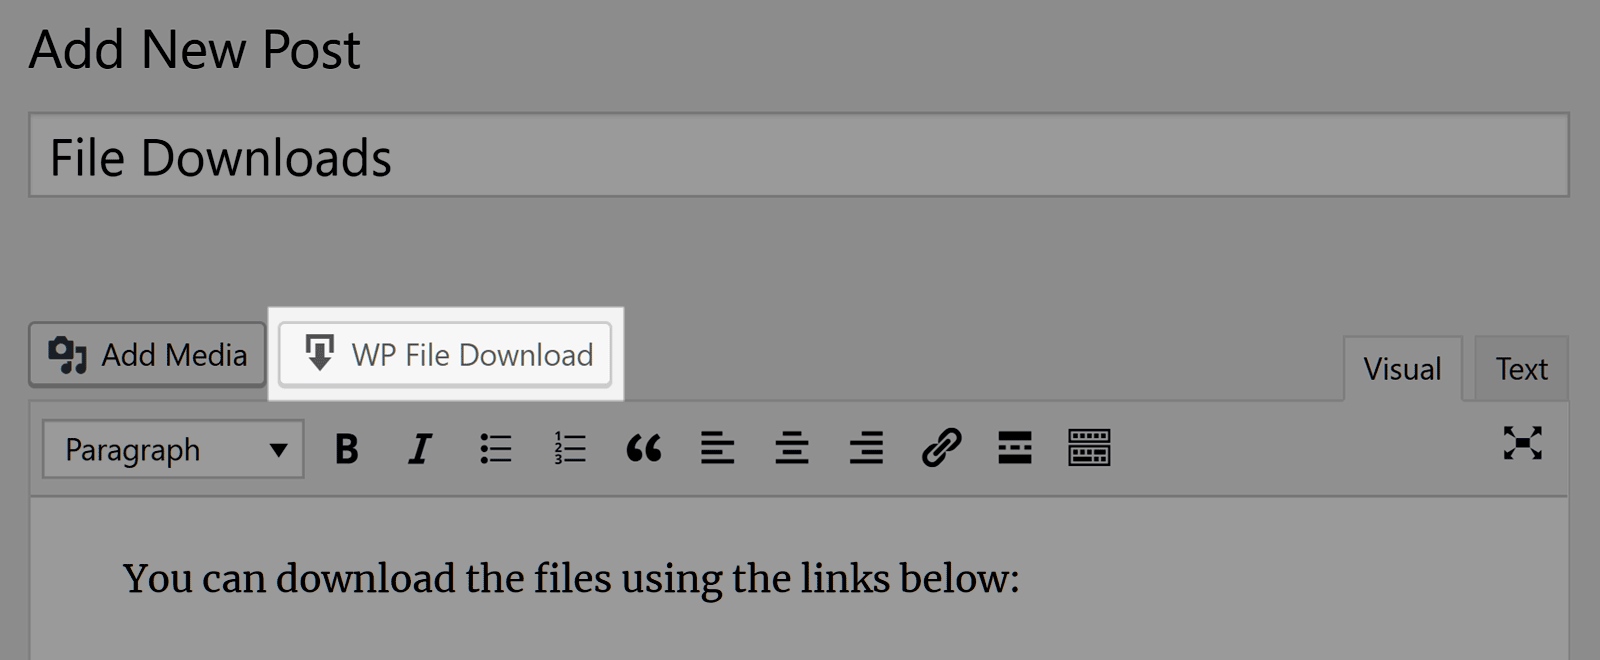 Post Editor Button